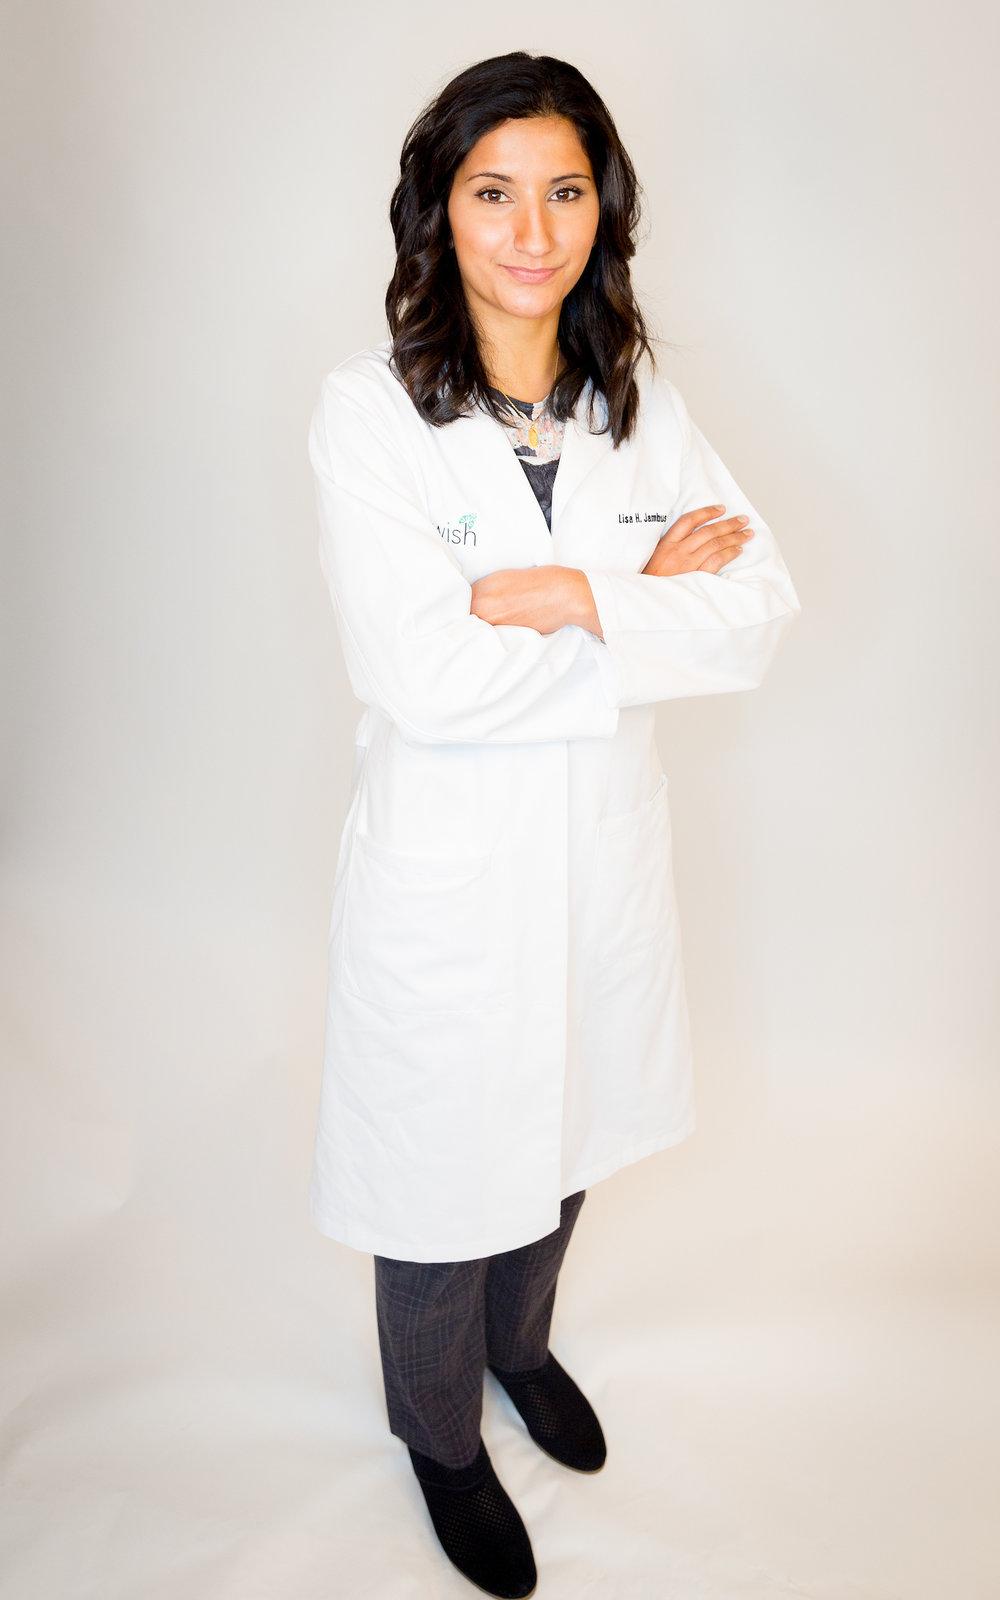 Lisa Jambusaria UroGynecologist at WISH Nashville